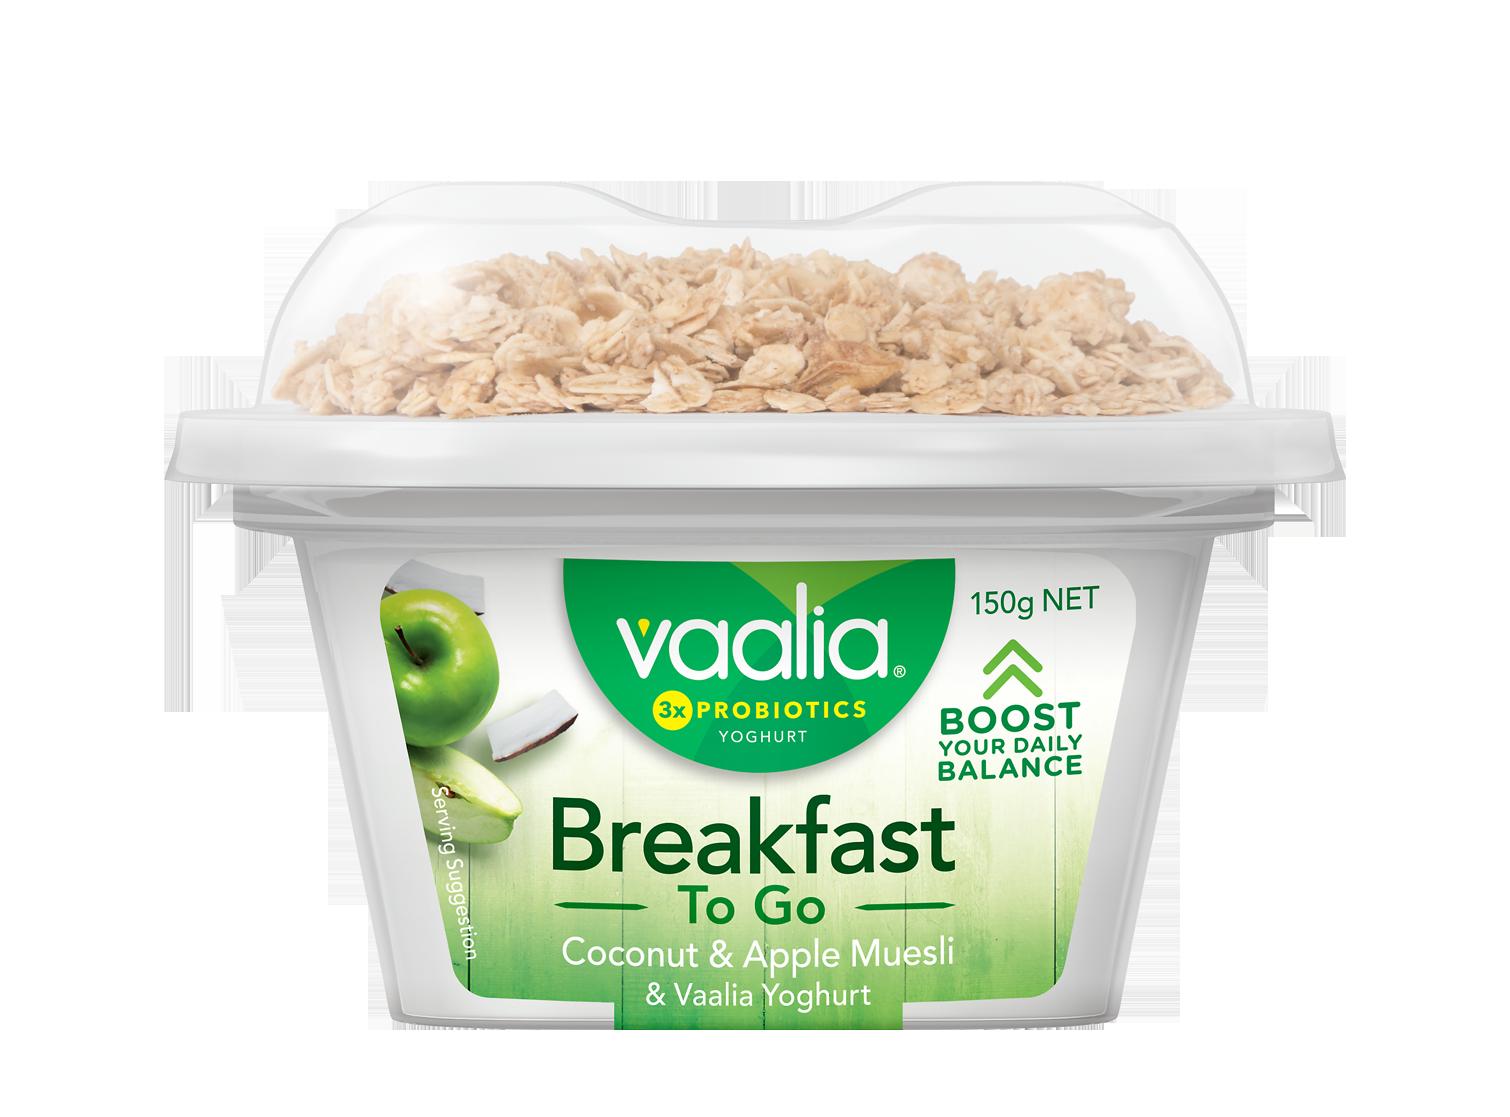 Vaalia Breakfast To Go 150g - Coconut Apple Muesli